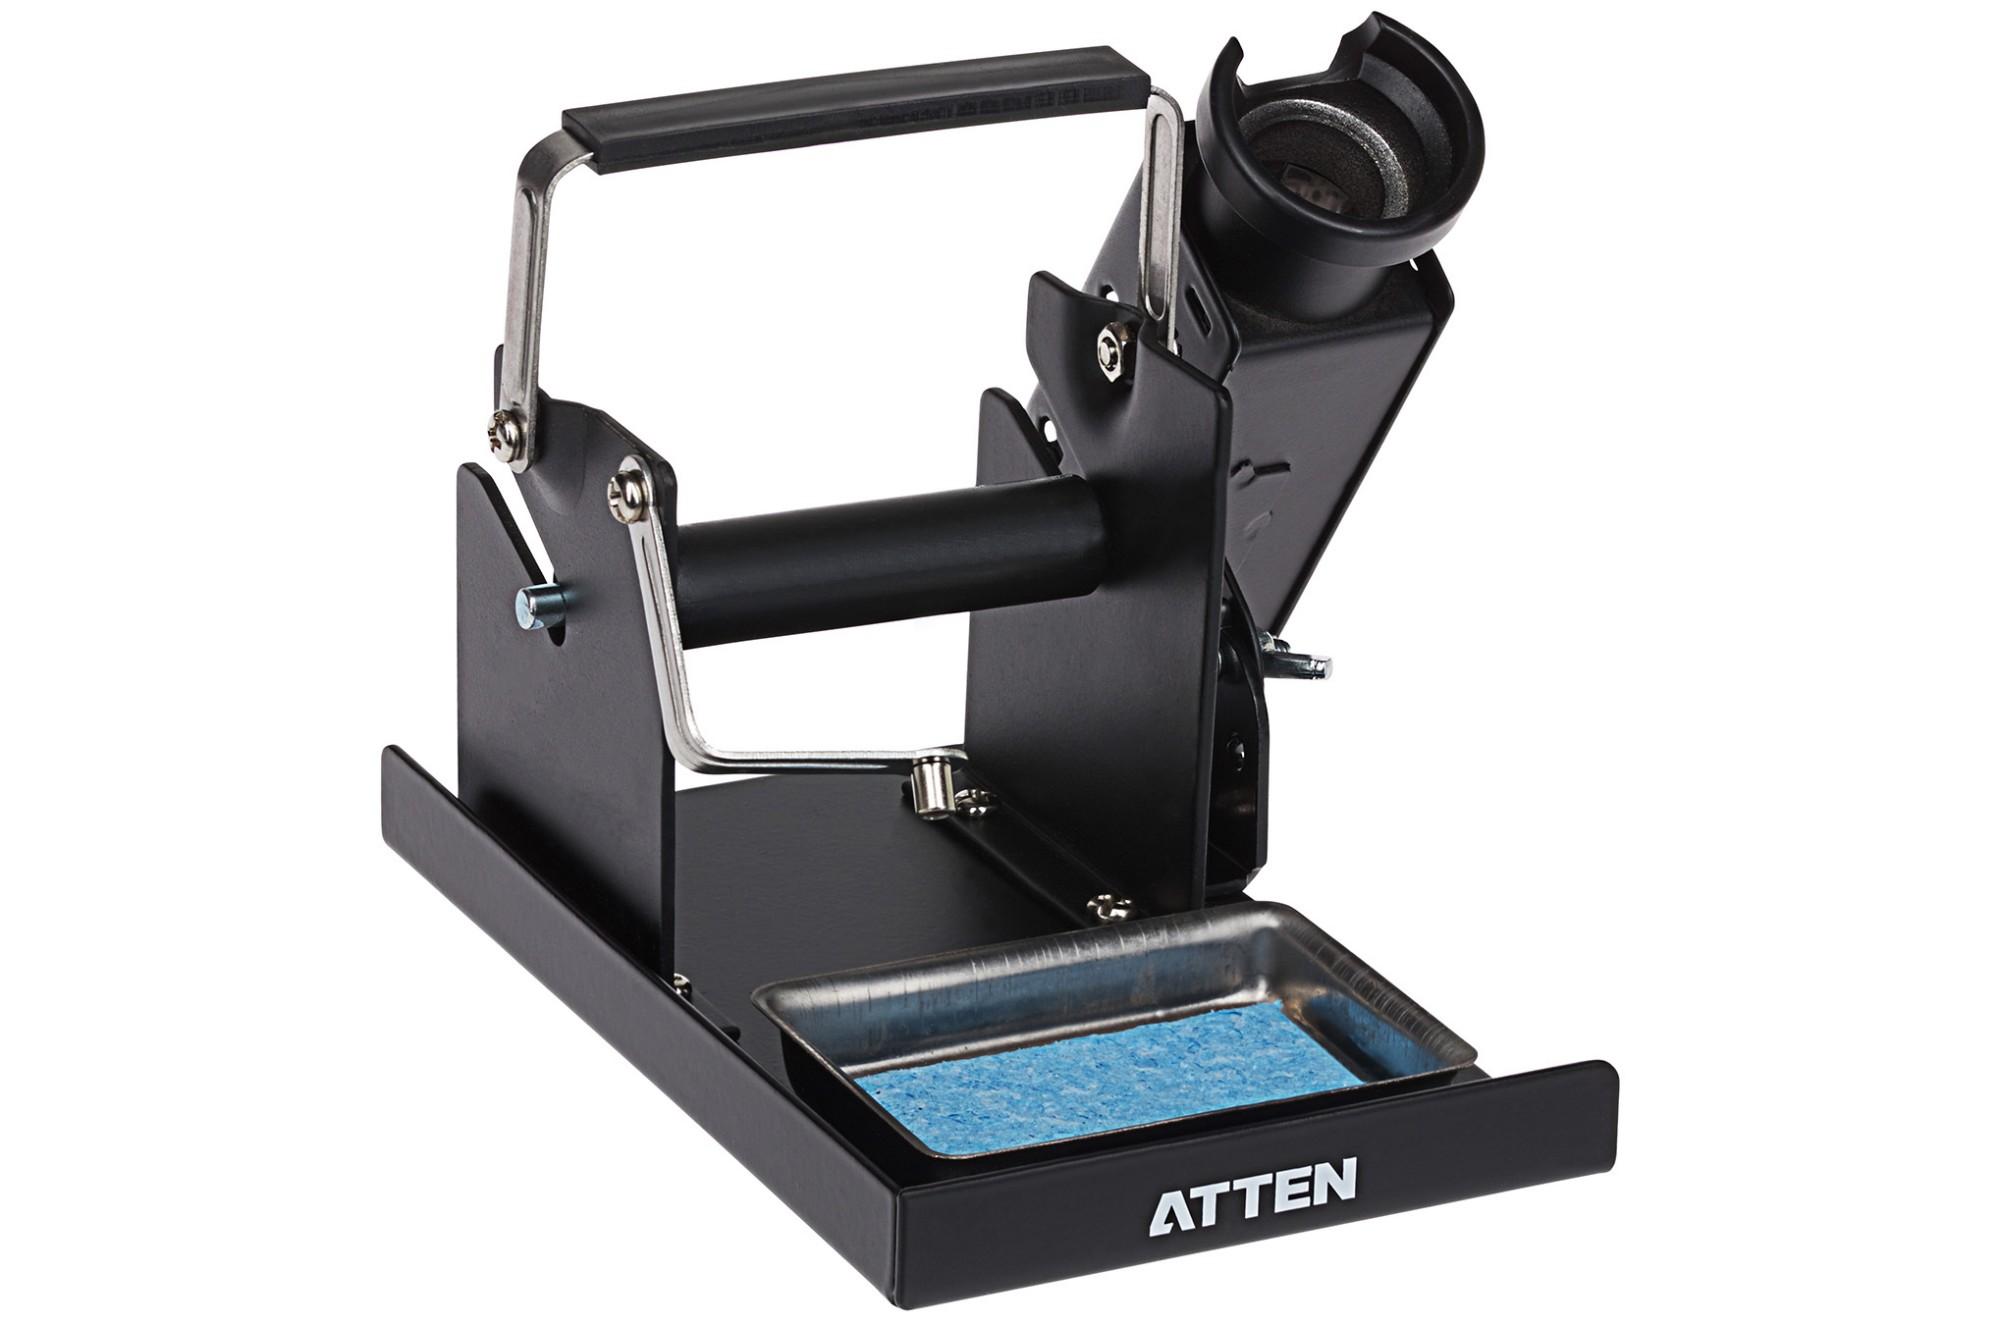 ATTEN TJ-228 Soldering Iron Stand & Tin Solder Wire Rack Dispense